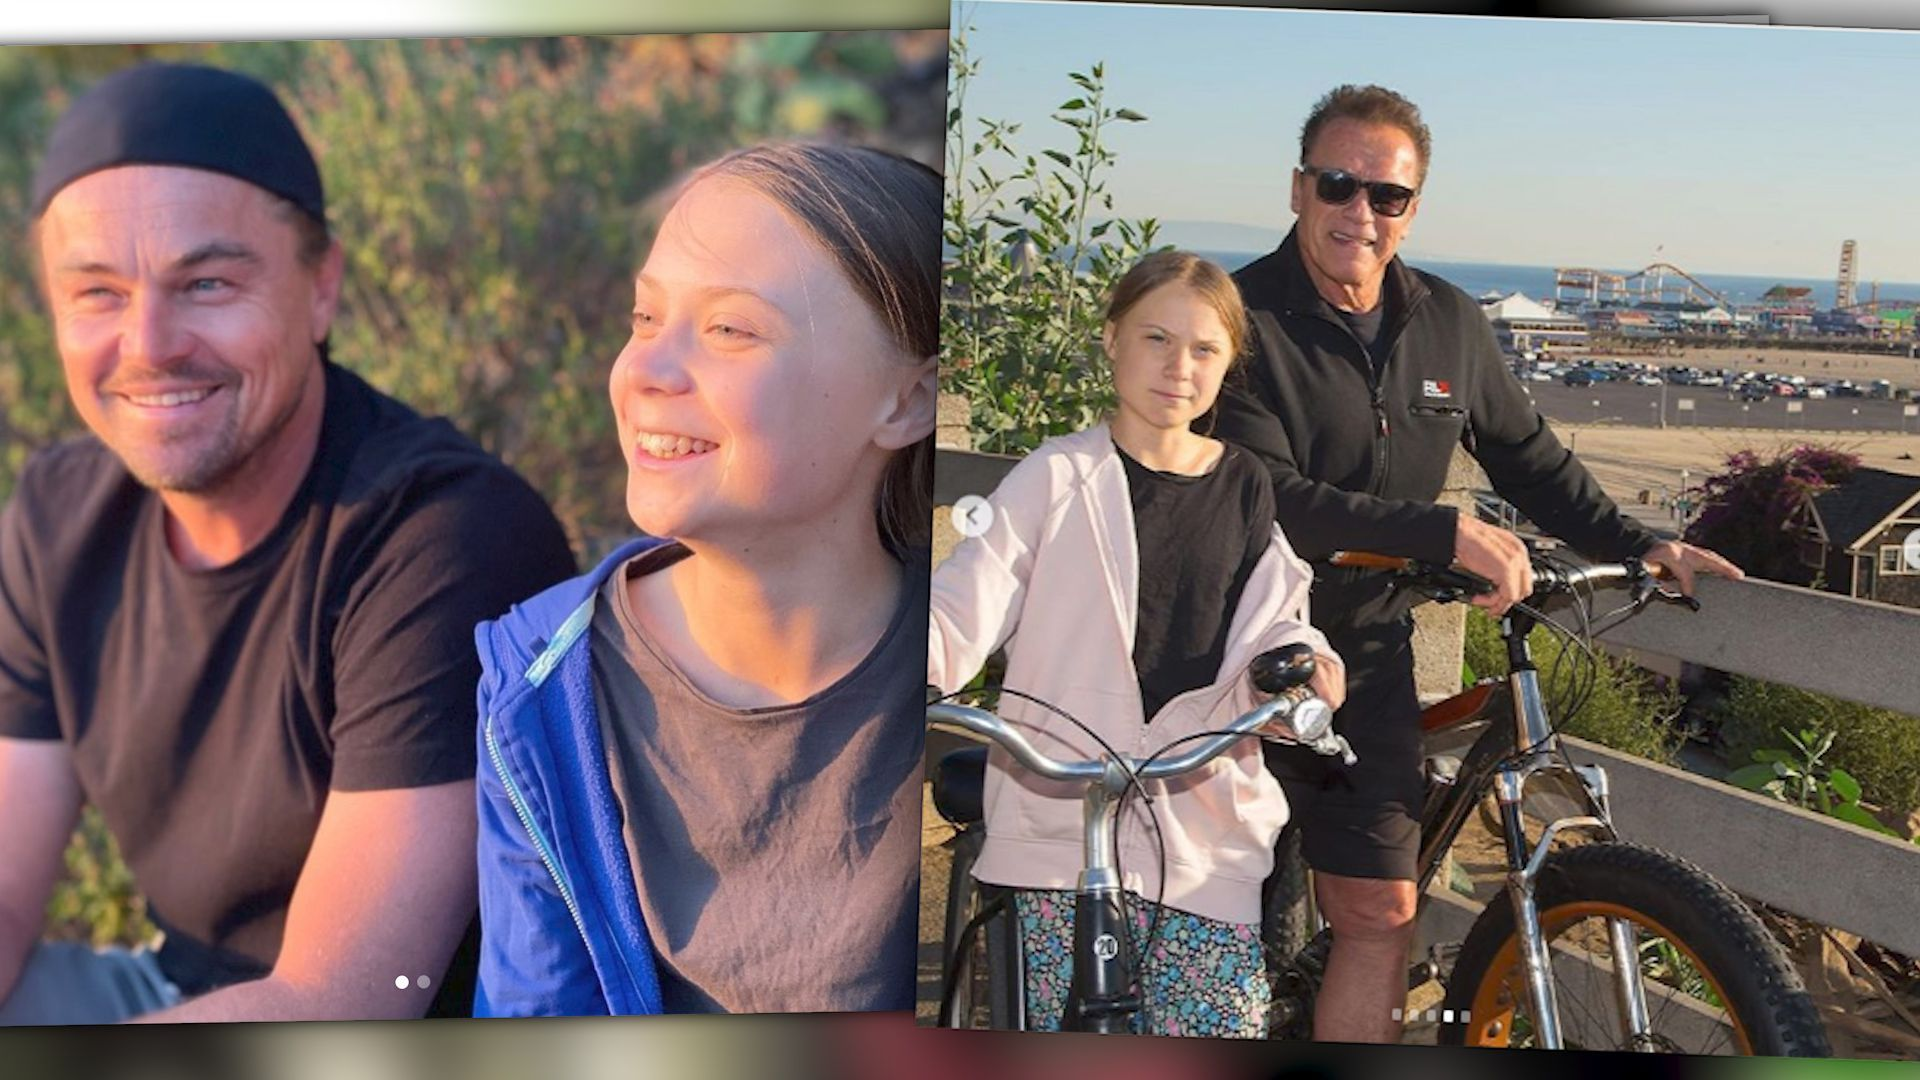 Auf dem Radel mit Arnold Schwarzenegger: Greta erobert Hollywood